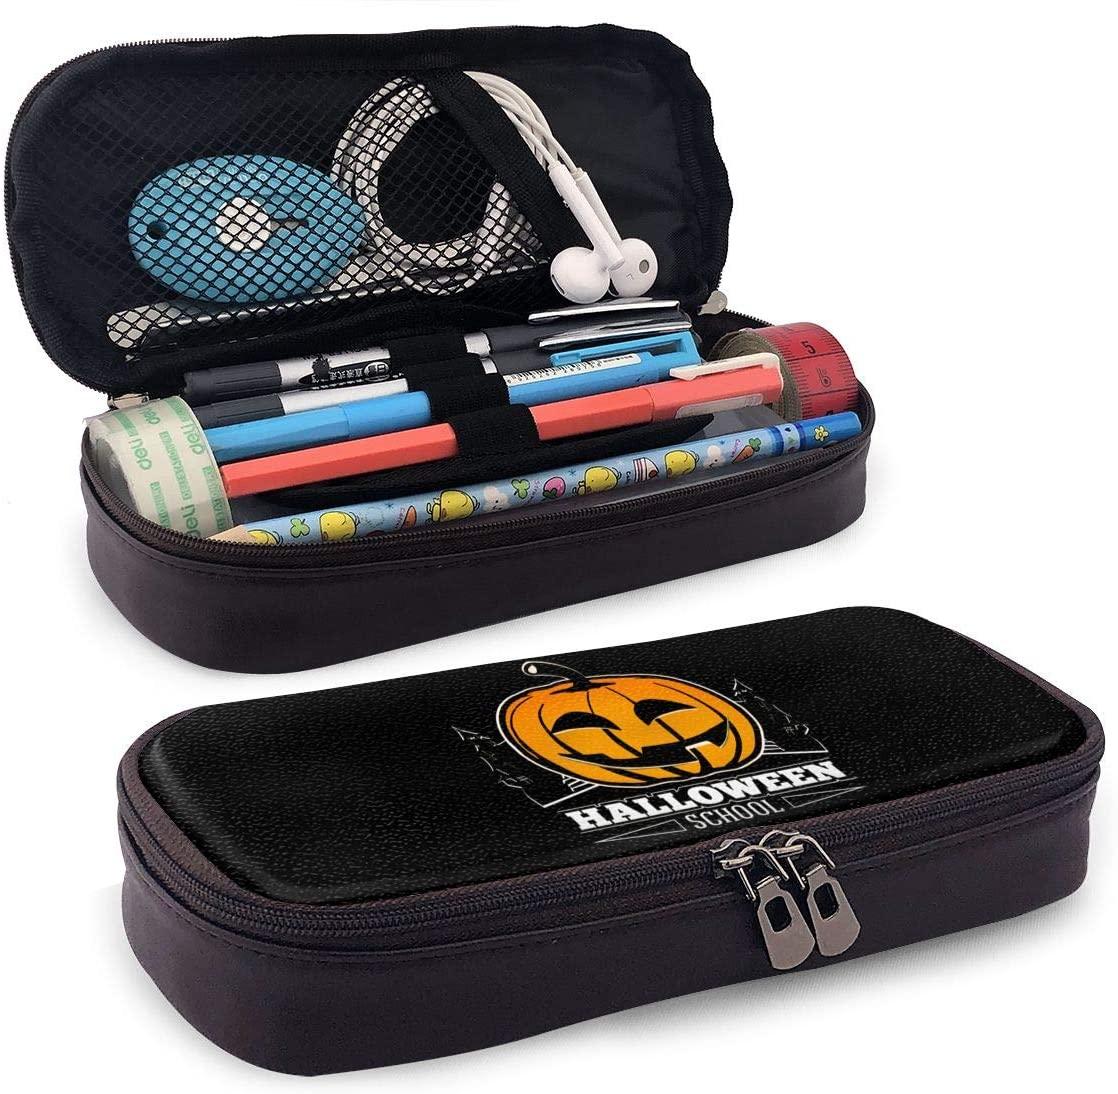 Halloween Teenager Pencil Bag, Small Tool Bag, Cosmetic Bag, Multi-Purpose Bag